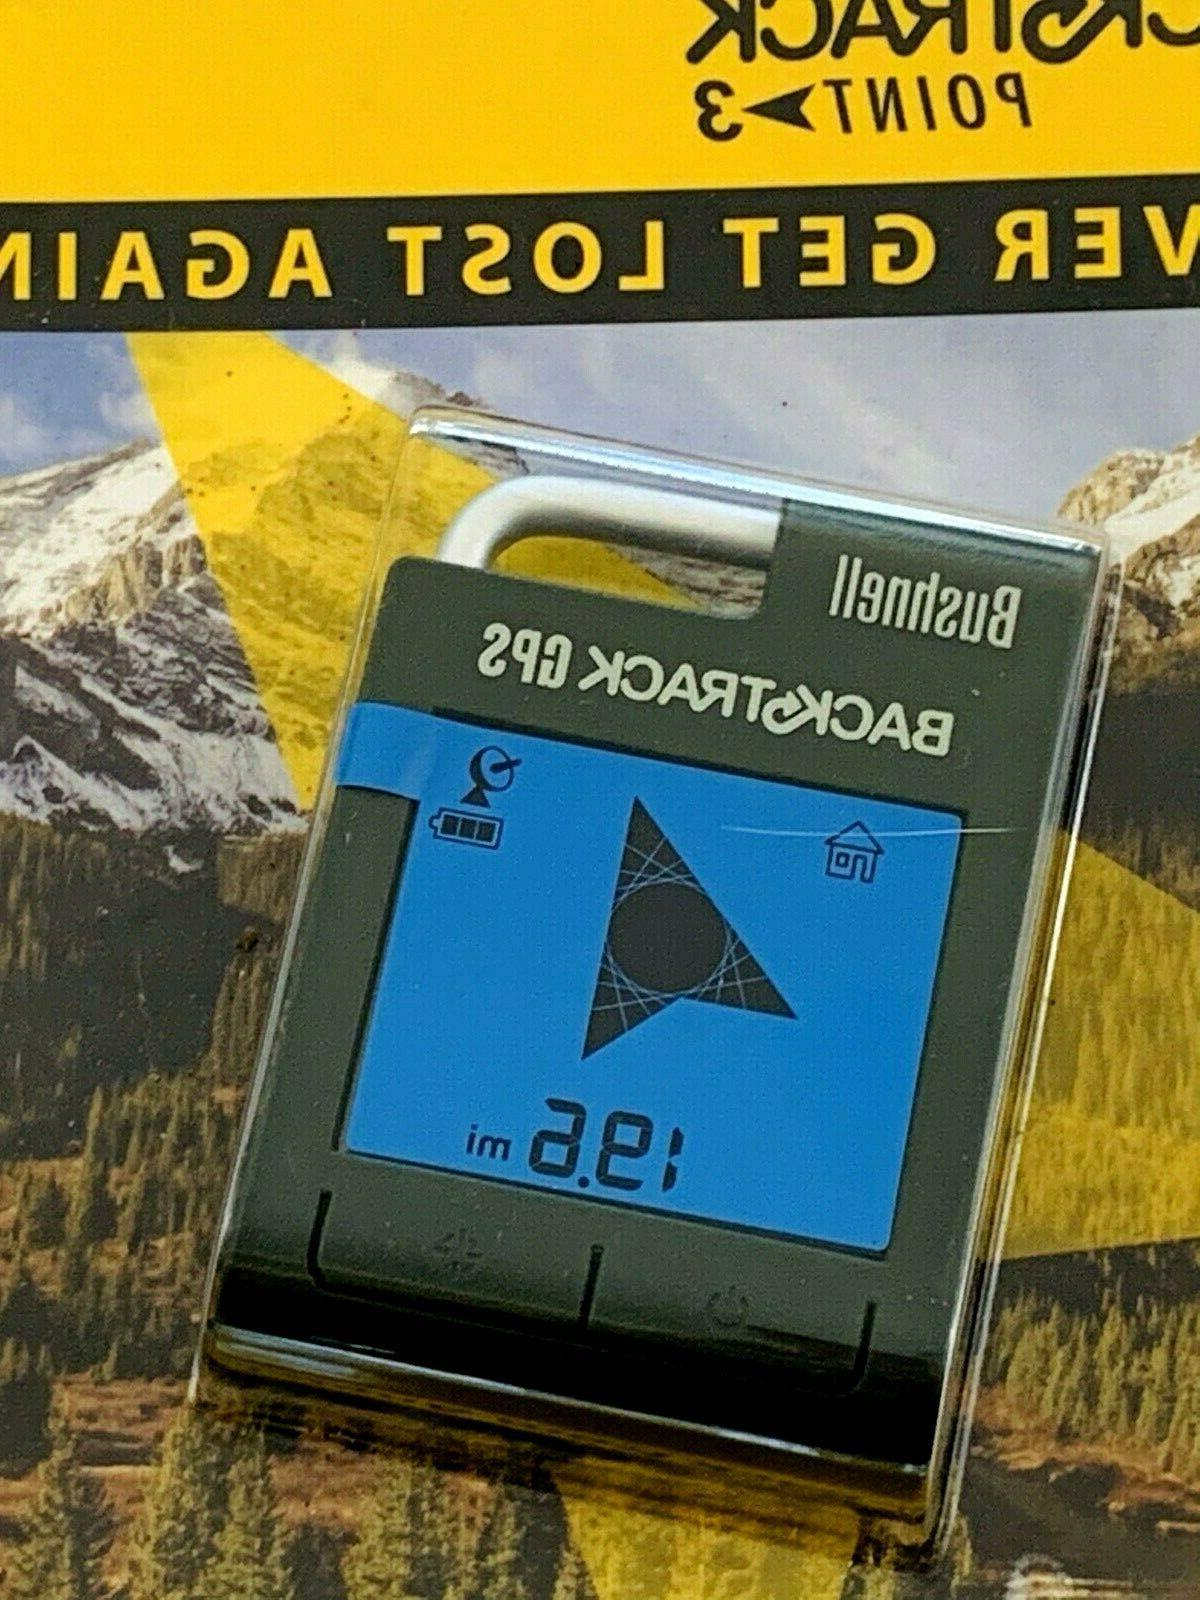 Bushnell BackTrack Point-3 GPS Digital Compass